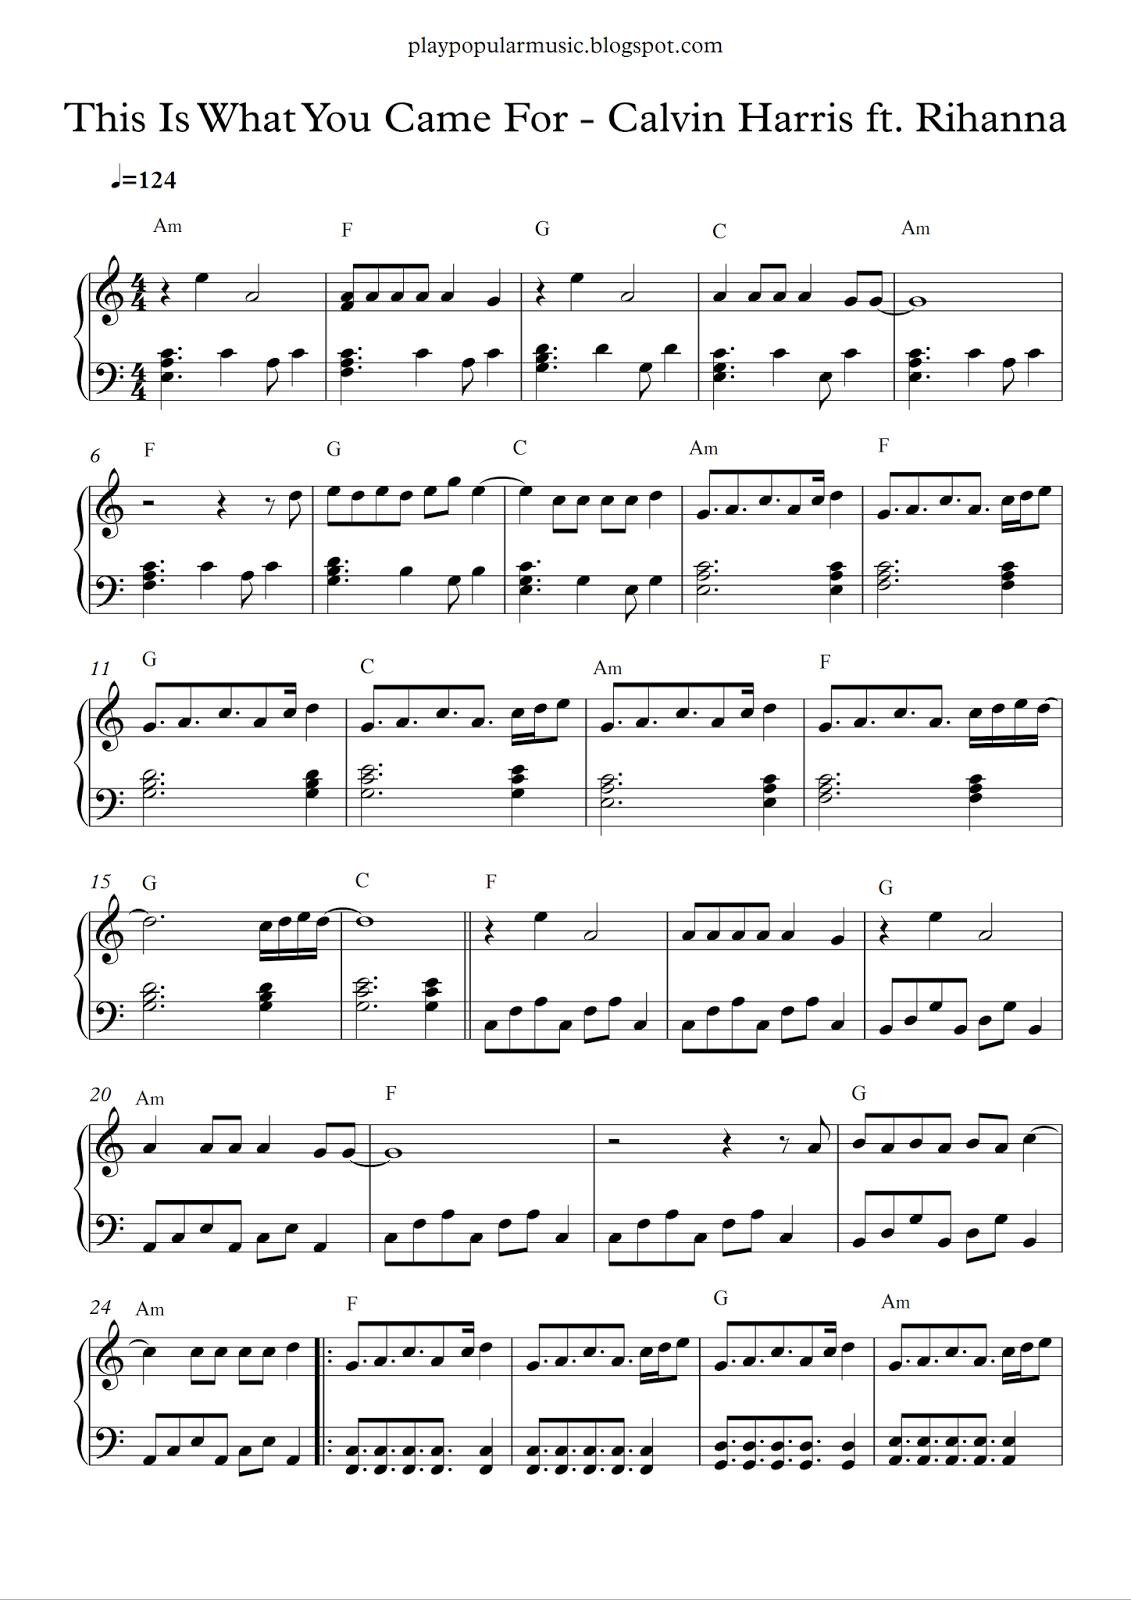 Comptine D Un Autre été Guitare Tab Free Piano Sheet Music This Is What You Came For Calvin Harris